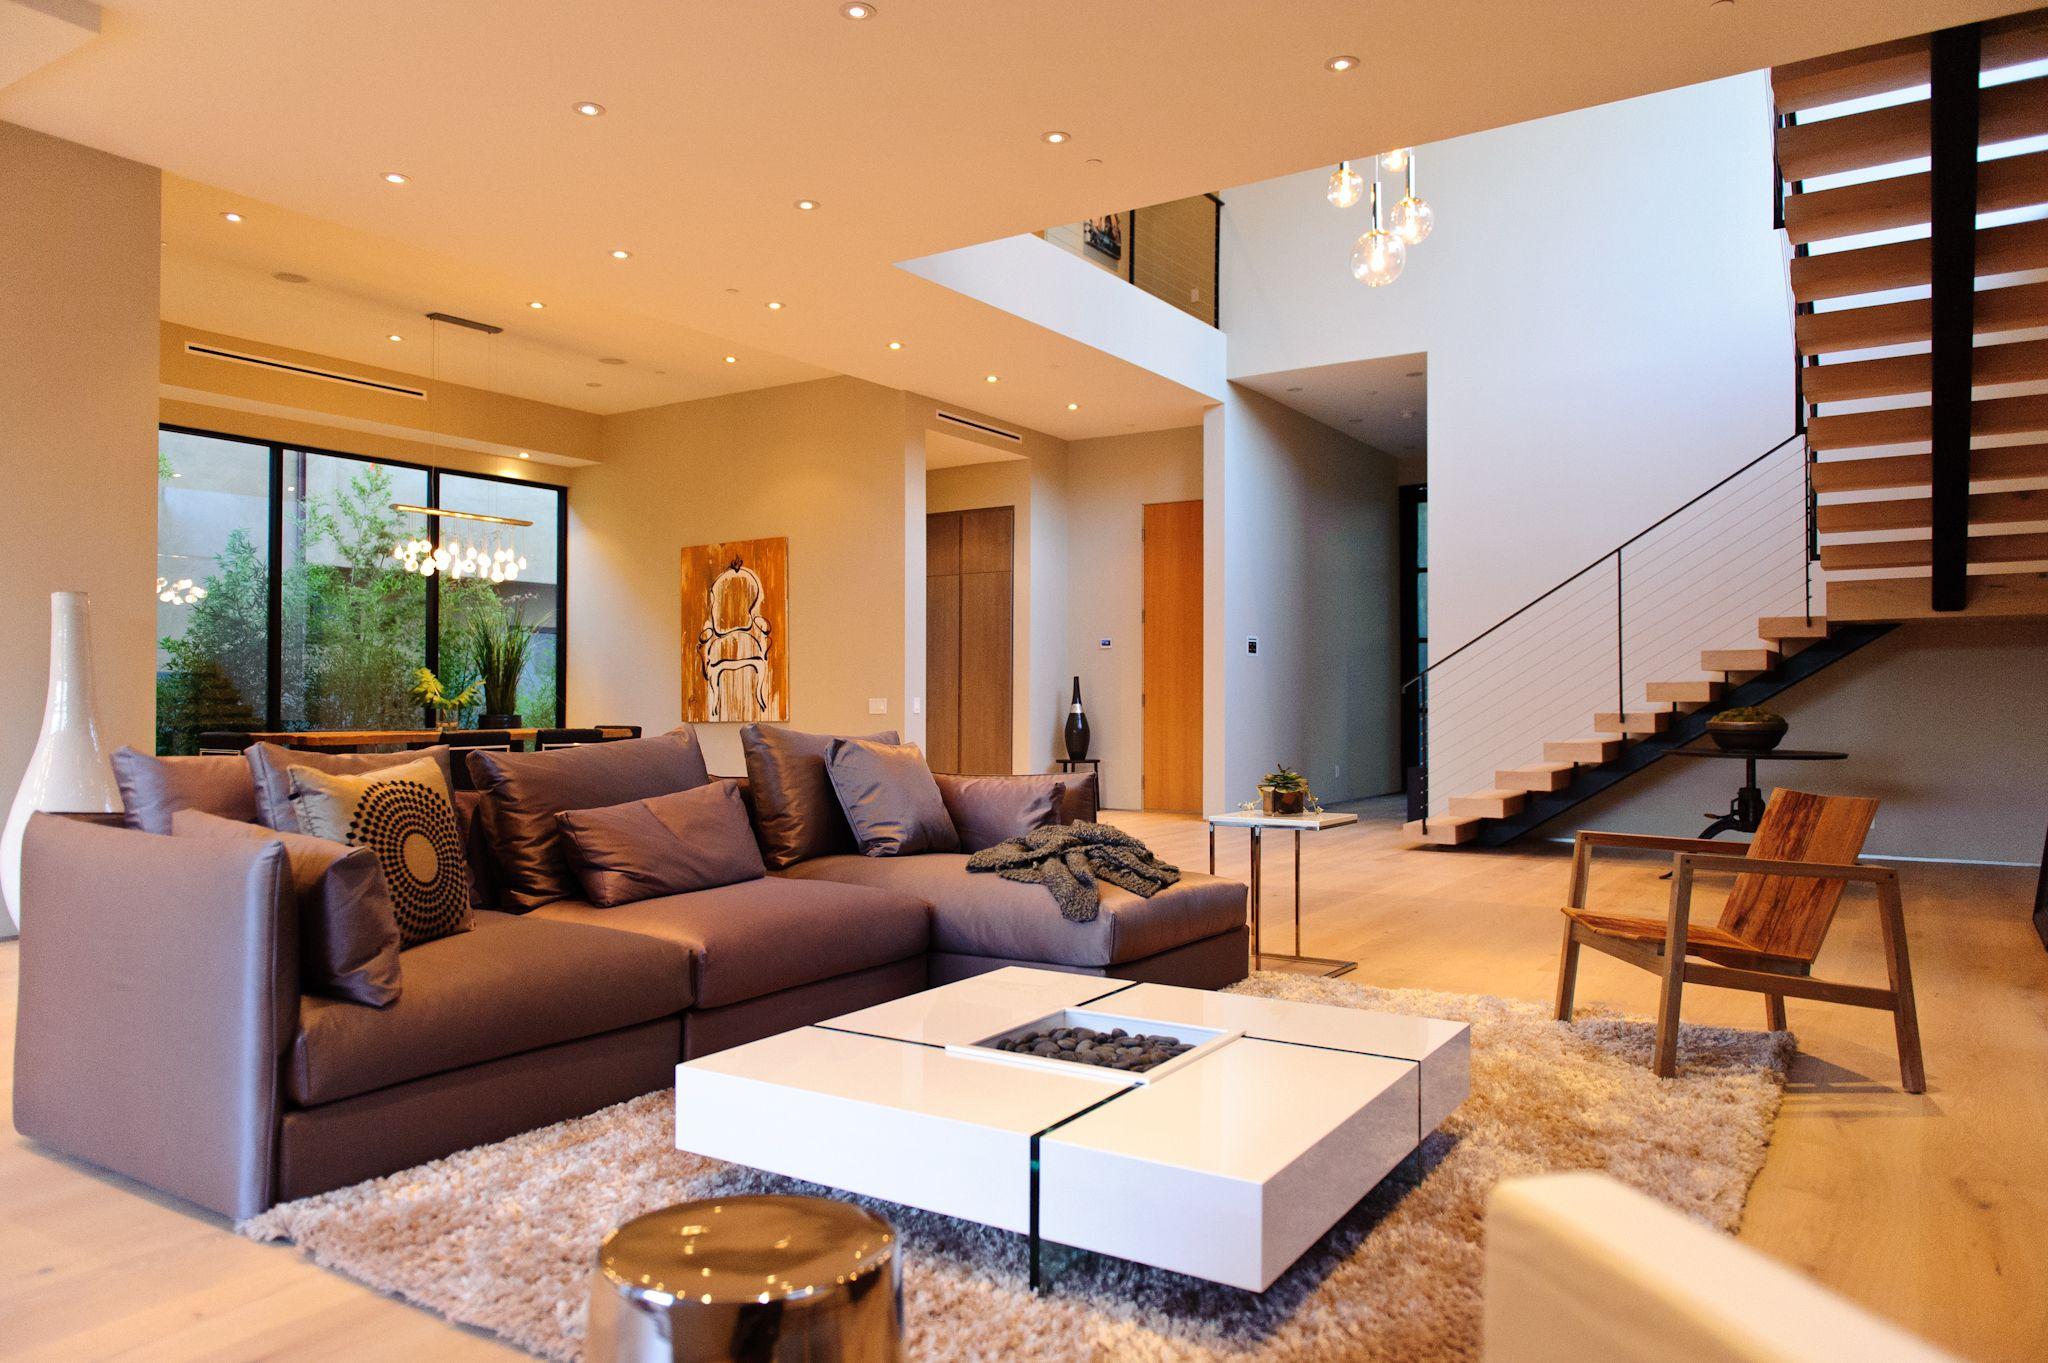 Prime Five Homes - Modern Living Room www.primefivehomes.com